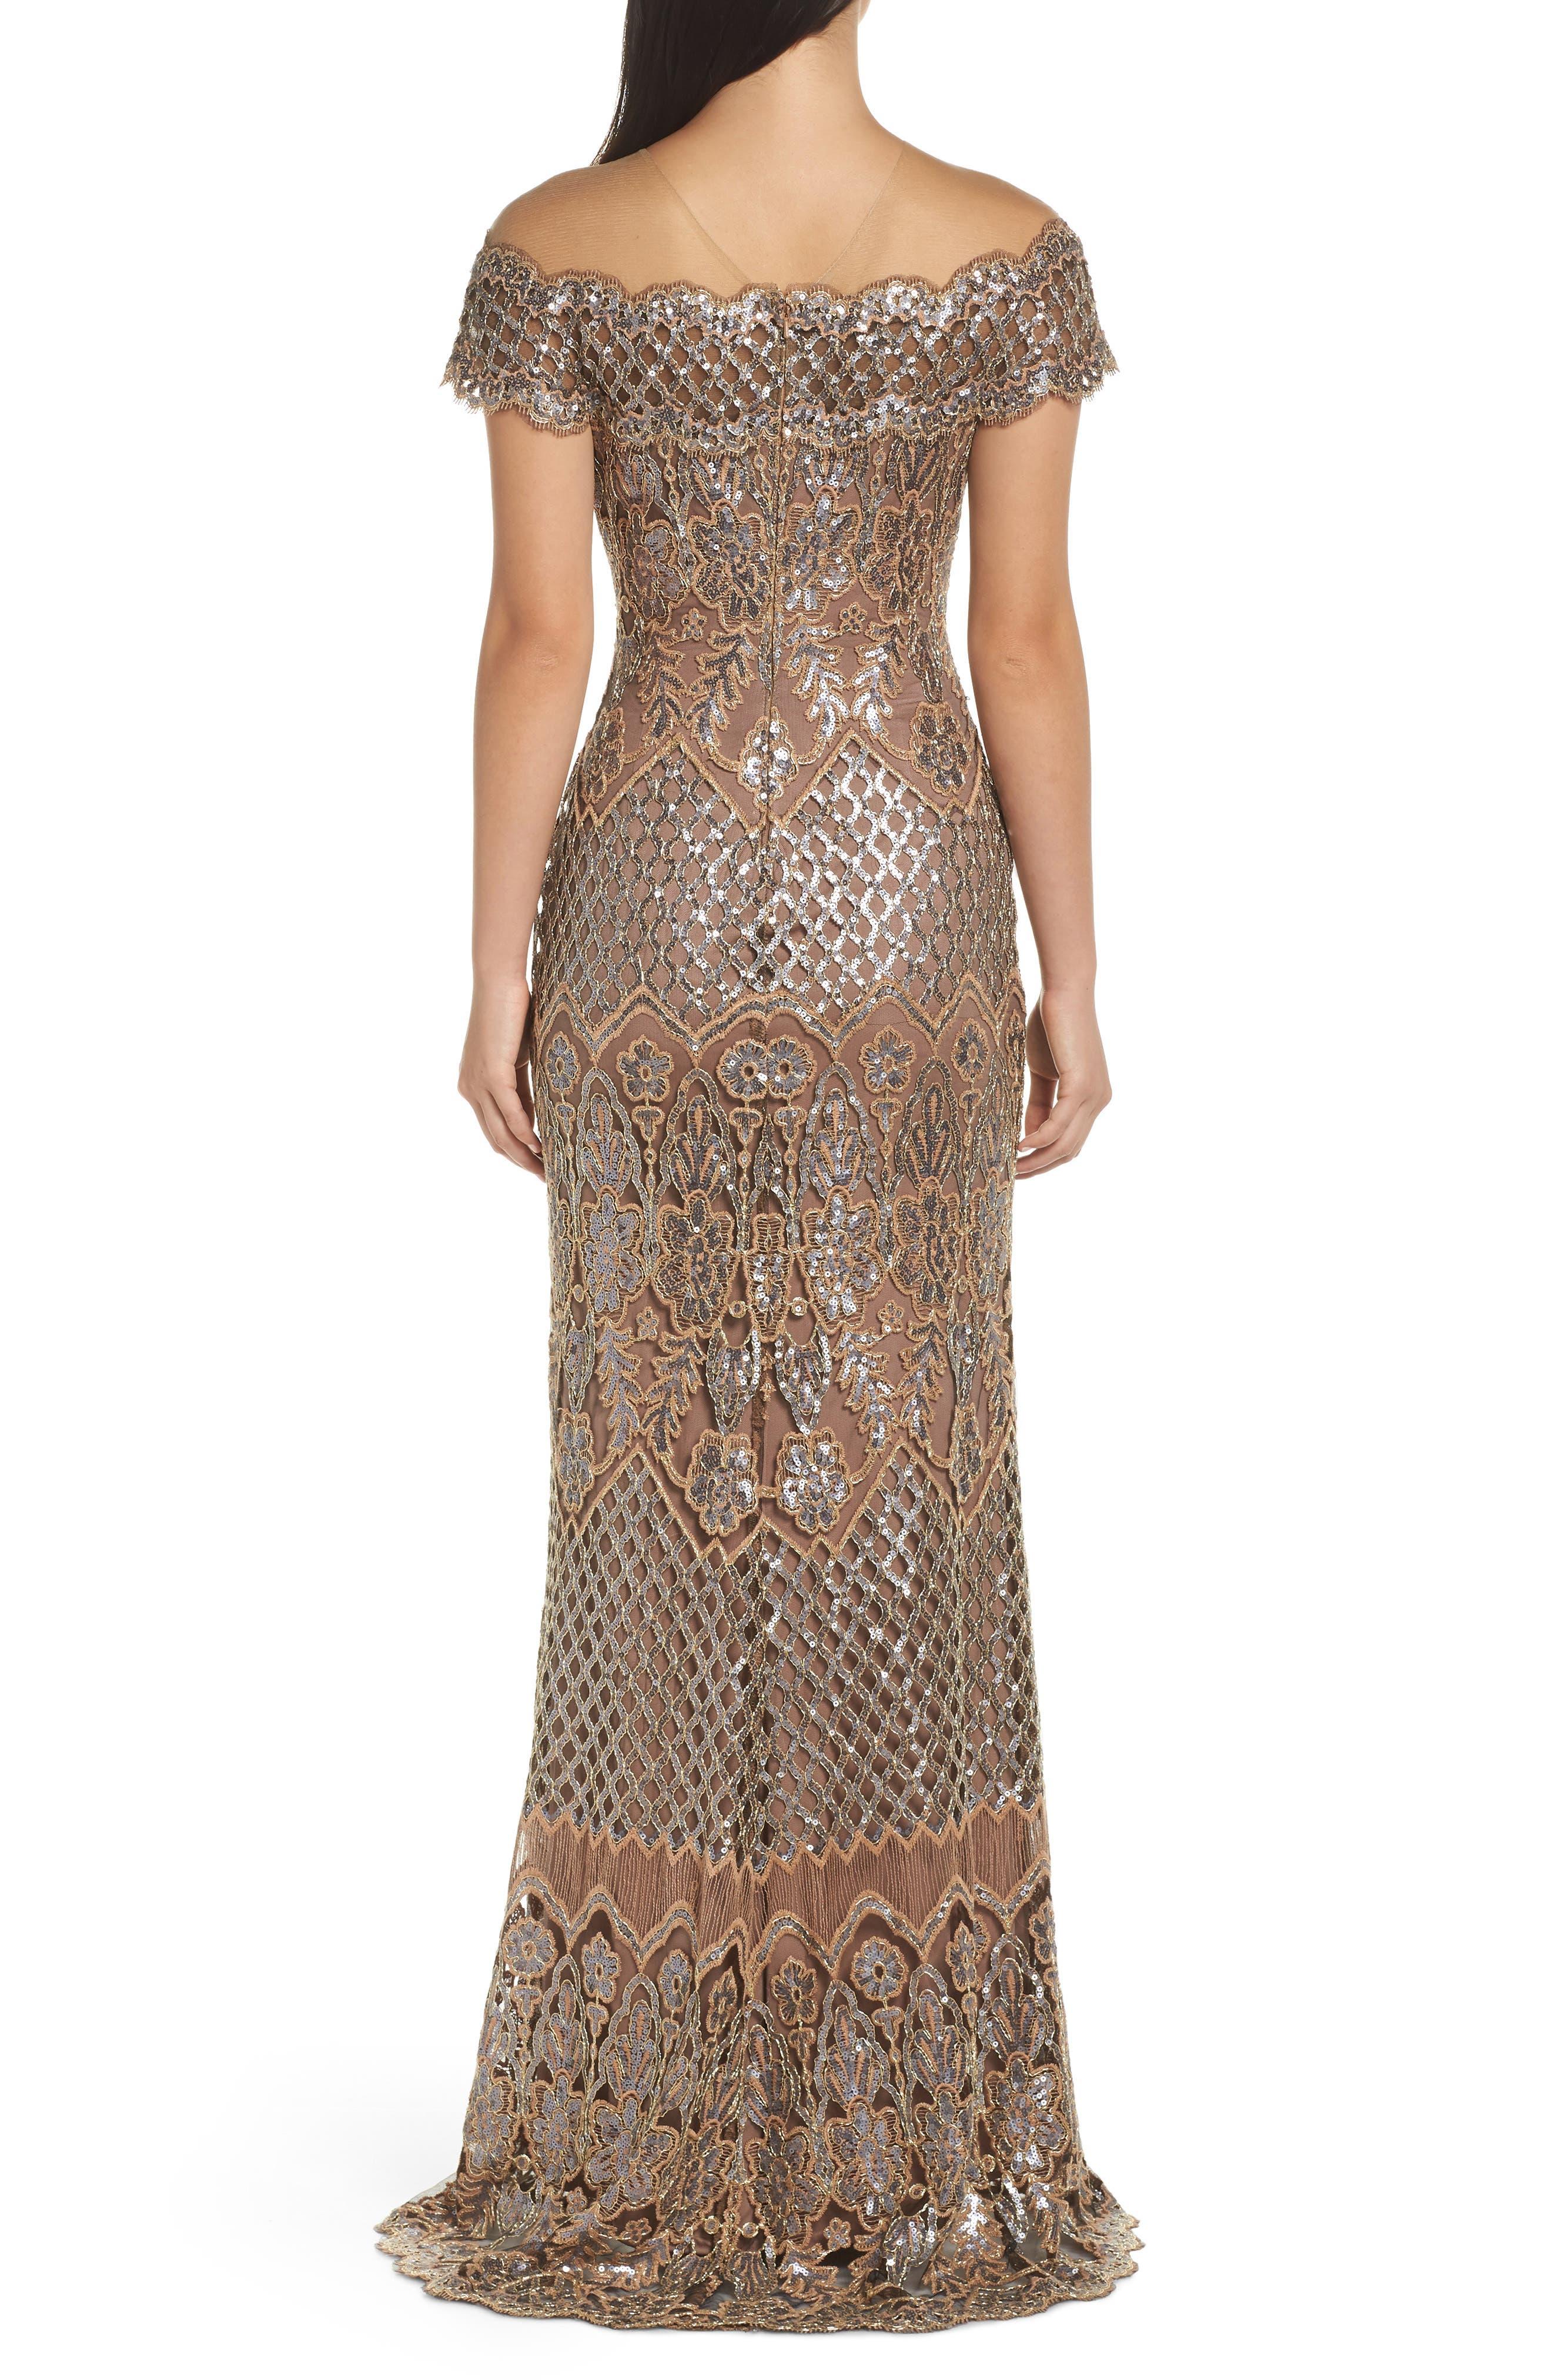 TADASHI SHOJI, Illusion Neck Sequin Lace Evening Dress, Alternate thumbnail 2, color, 230